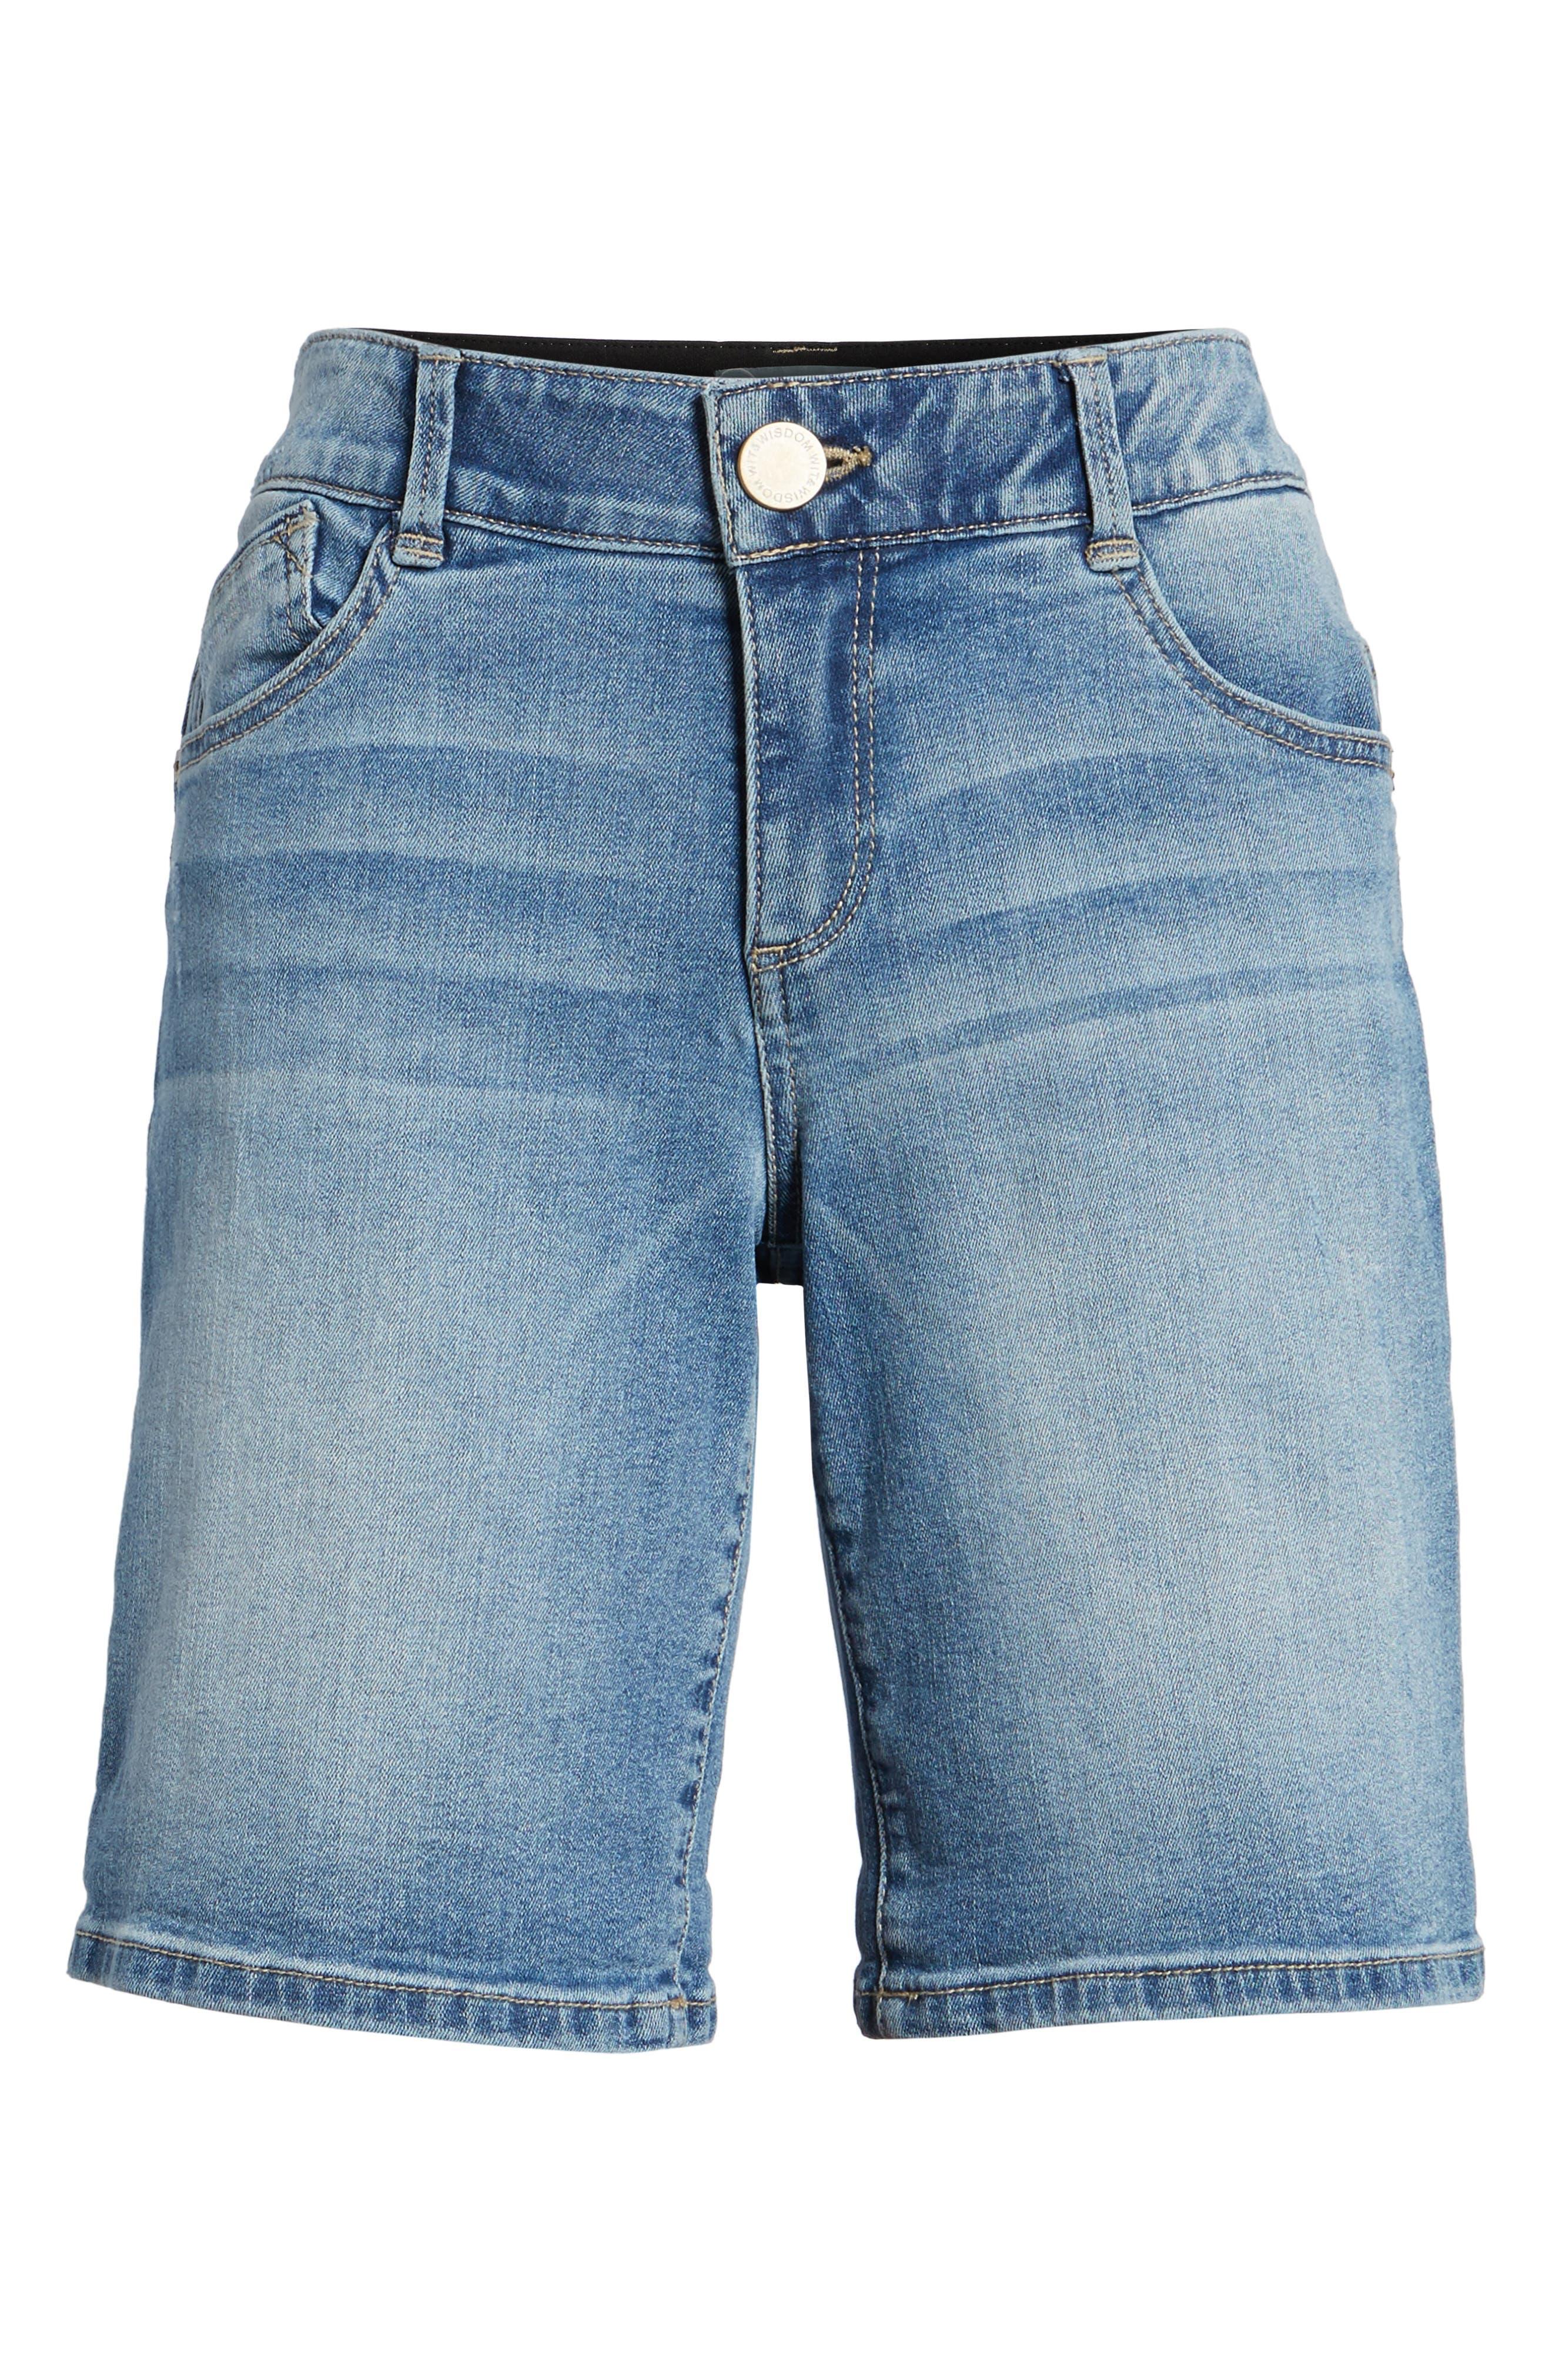 Ab-solution Denim Bermuda Shorts,                             Alternate thumbnail 6, color,                             Light Blue